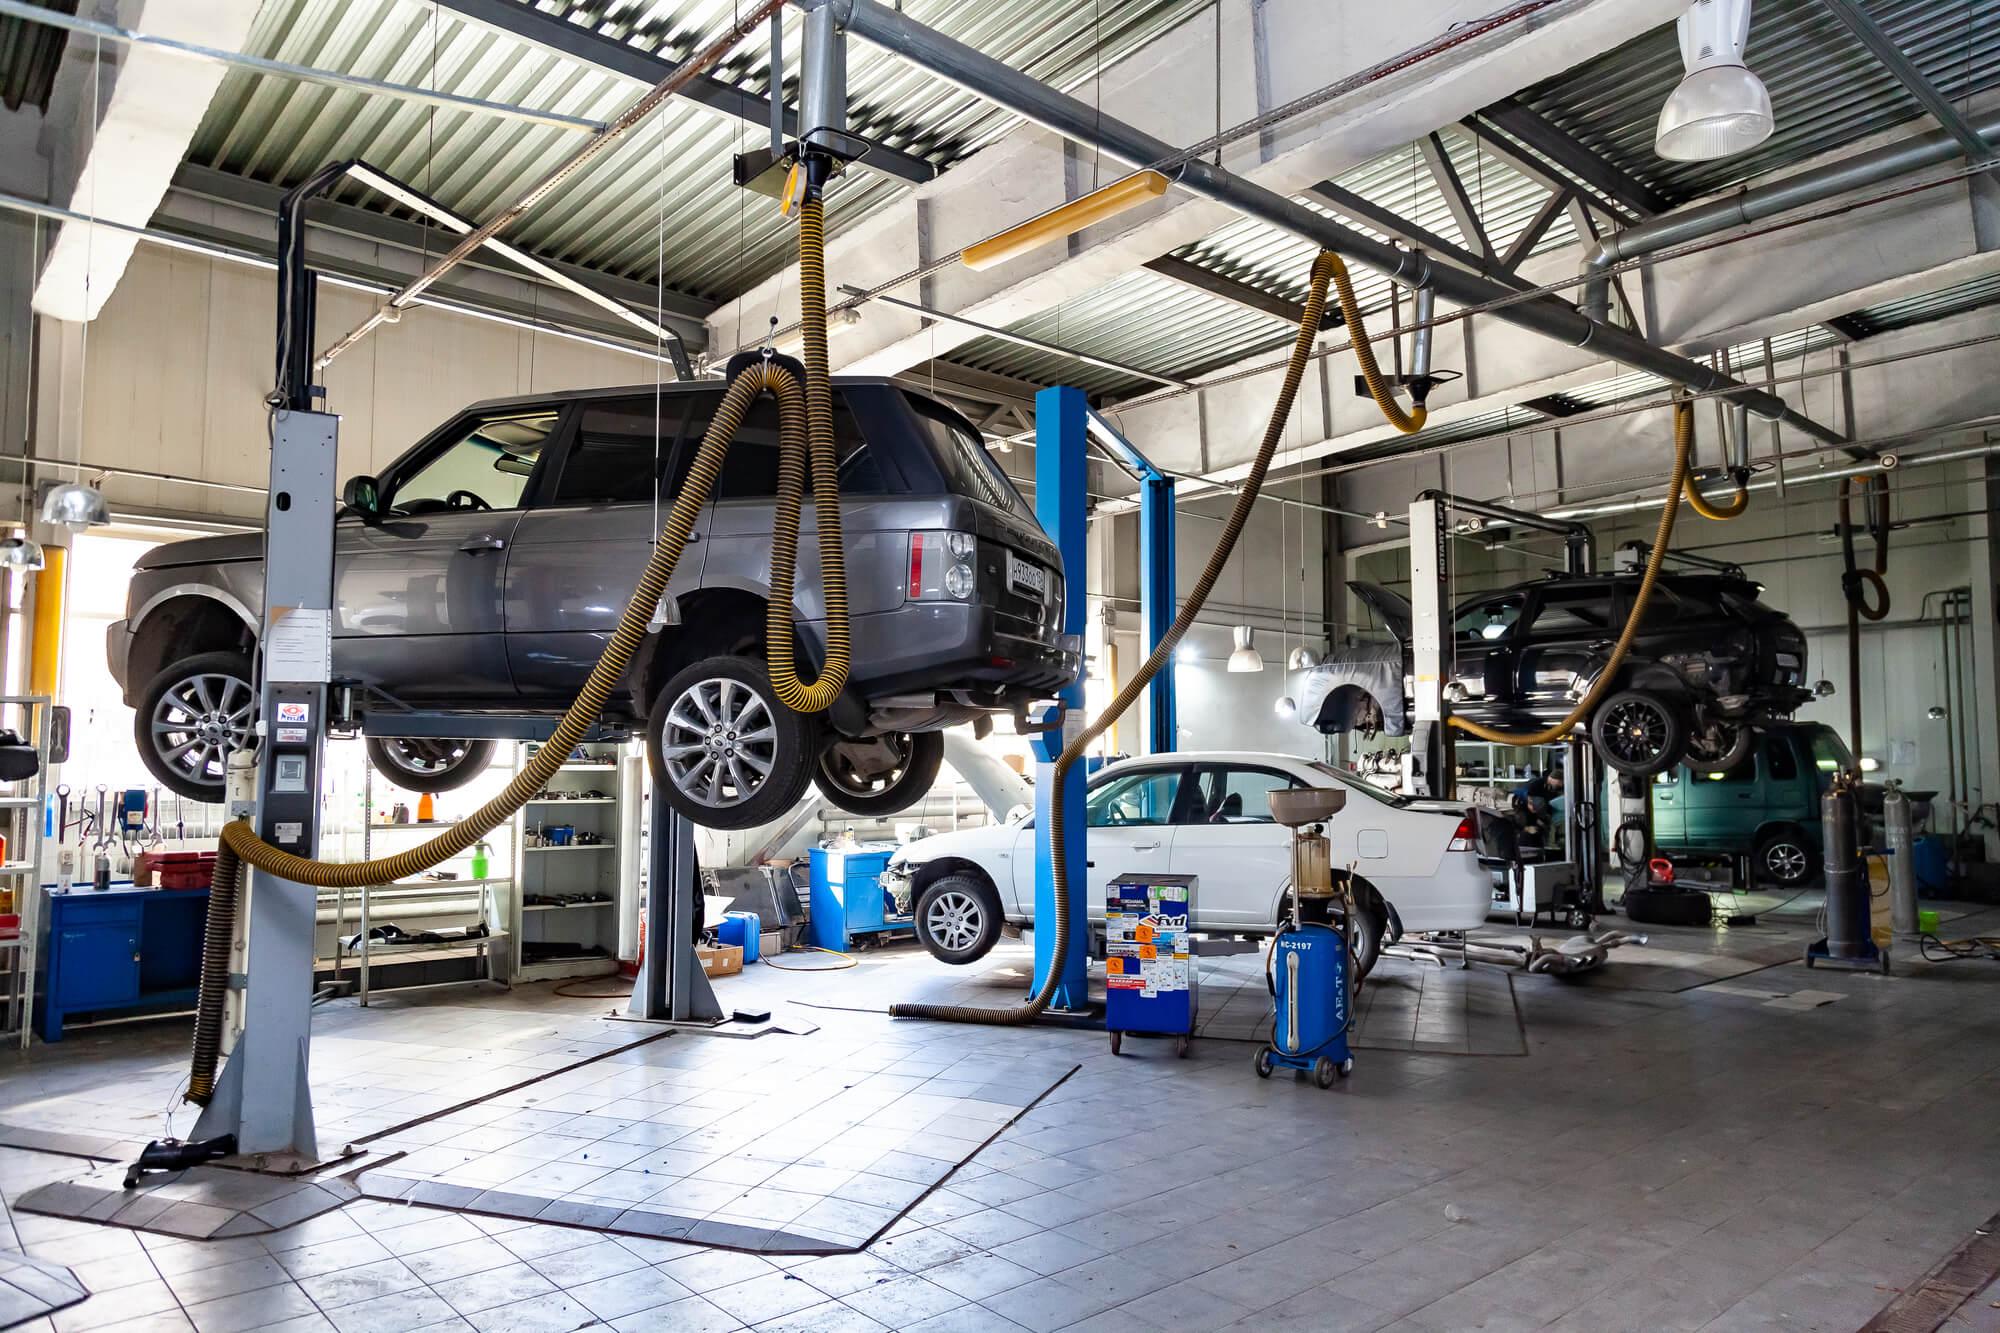 where is the best land rover repair davie fl?